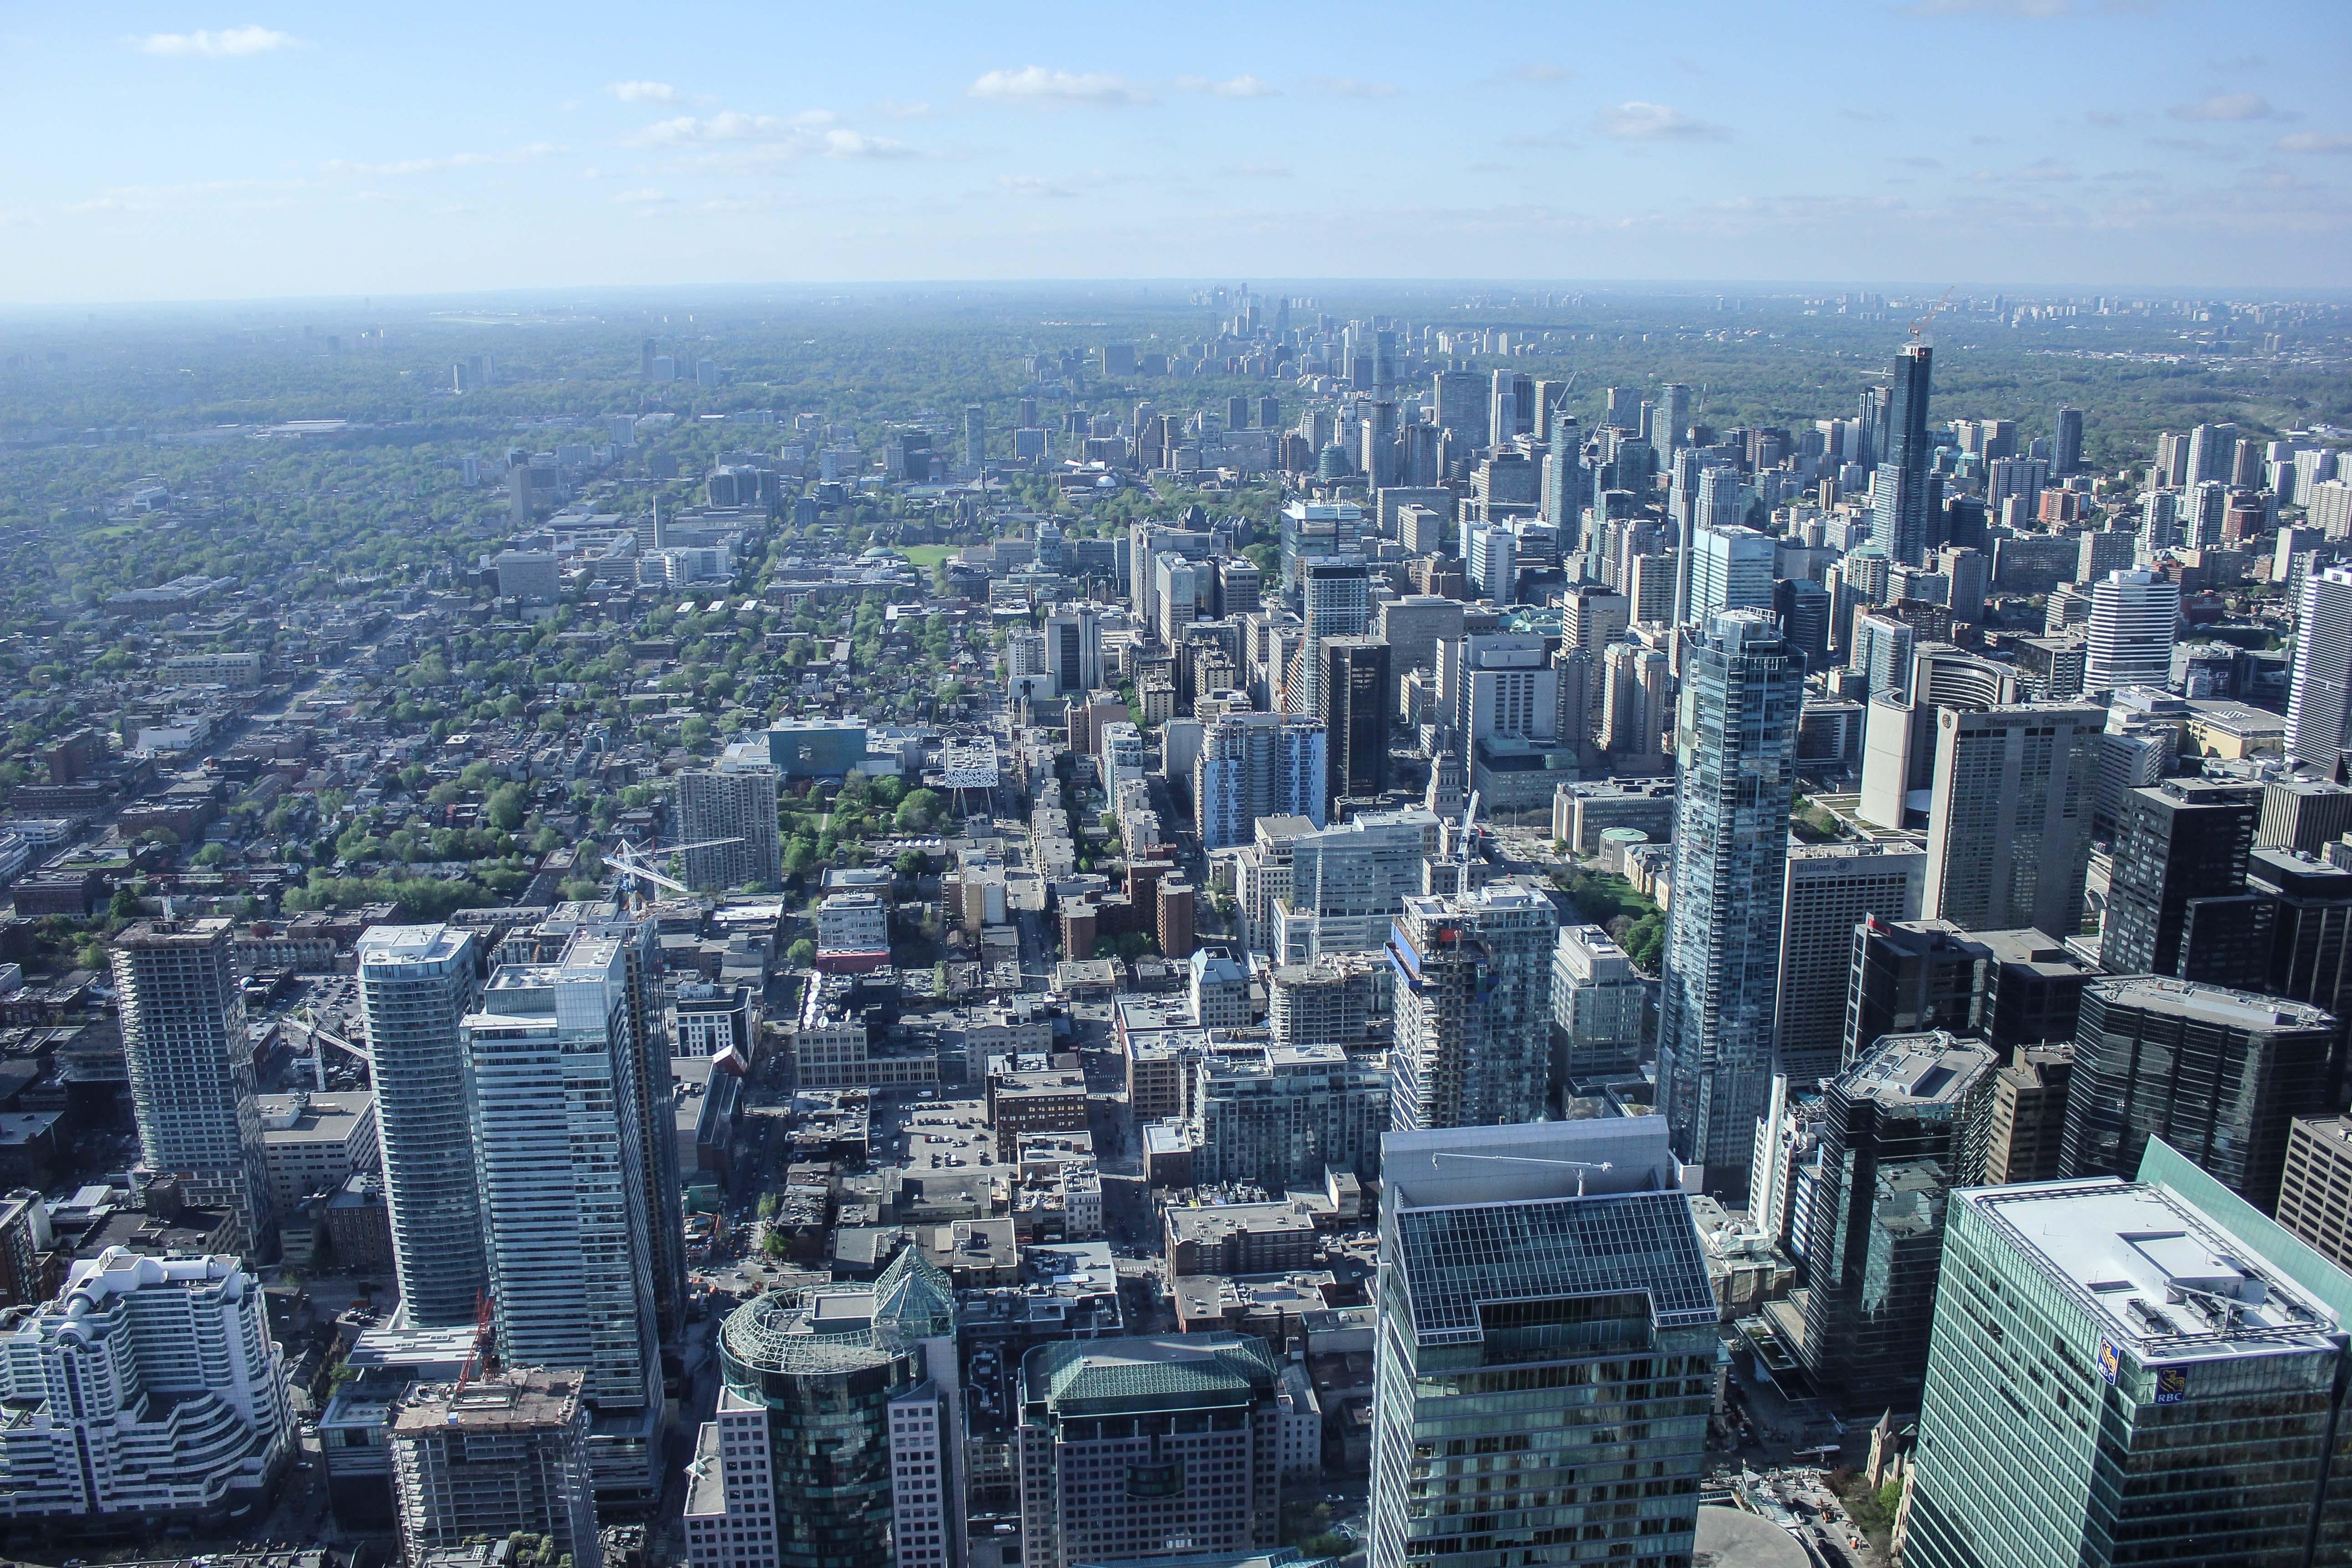 Free stock photo of city, bird's eye view, skyline, buildings